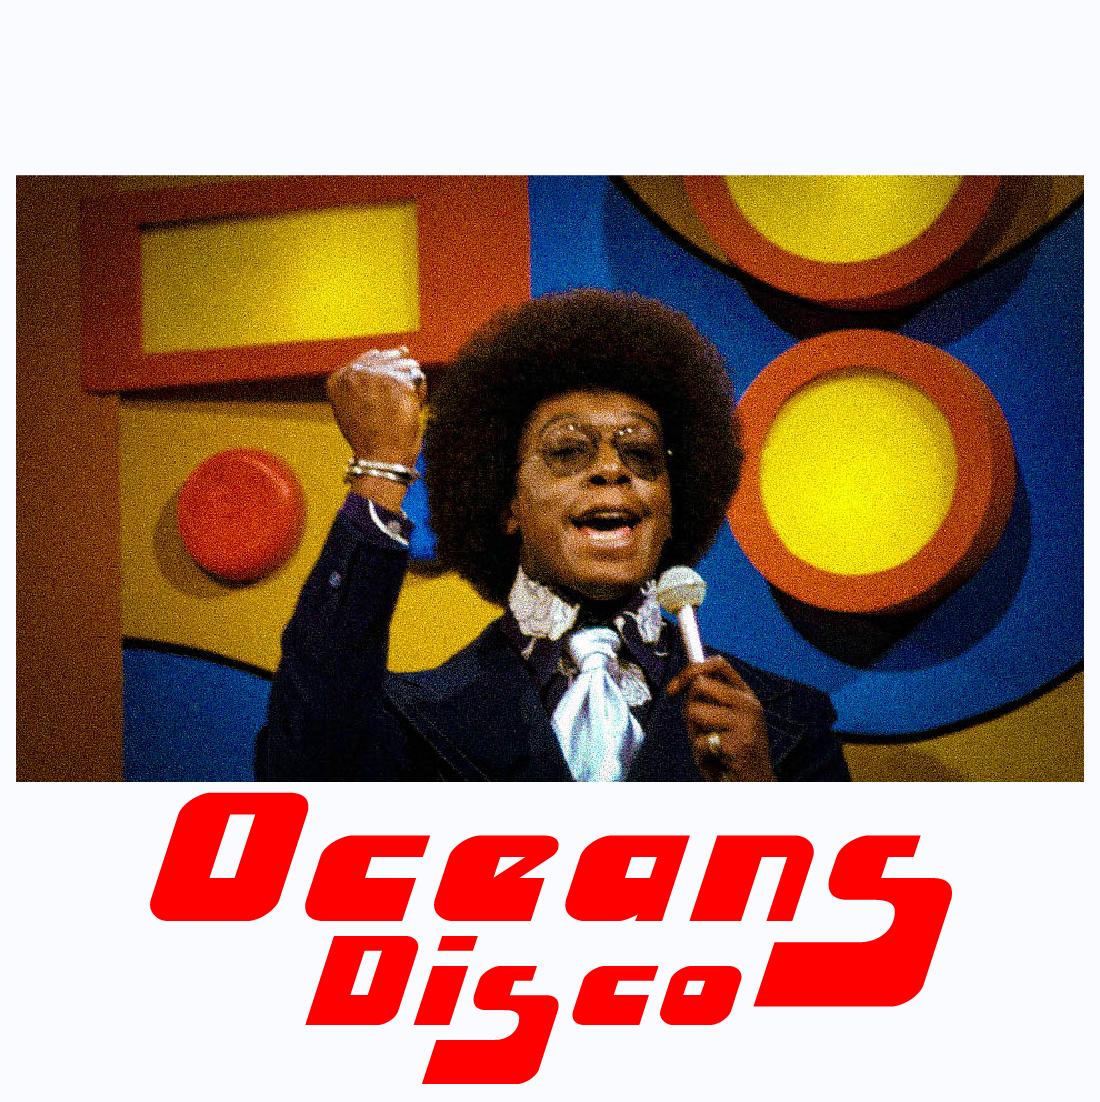 Oceans Disco.png